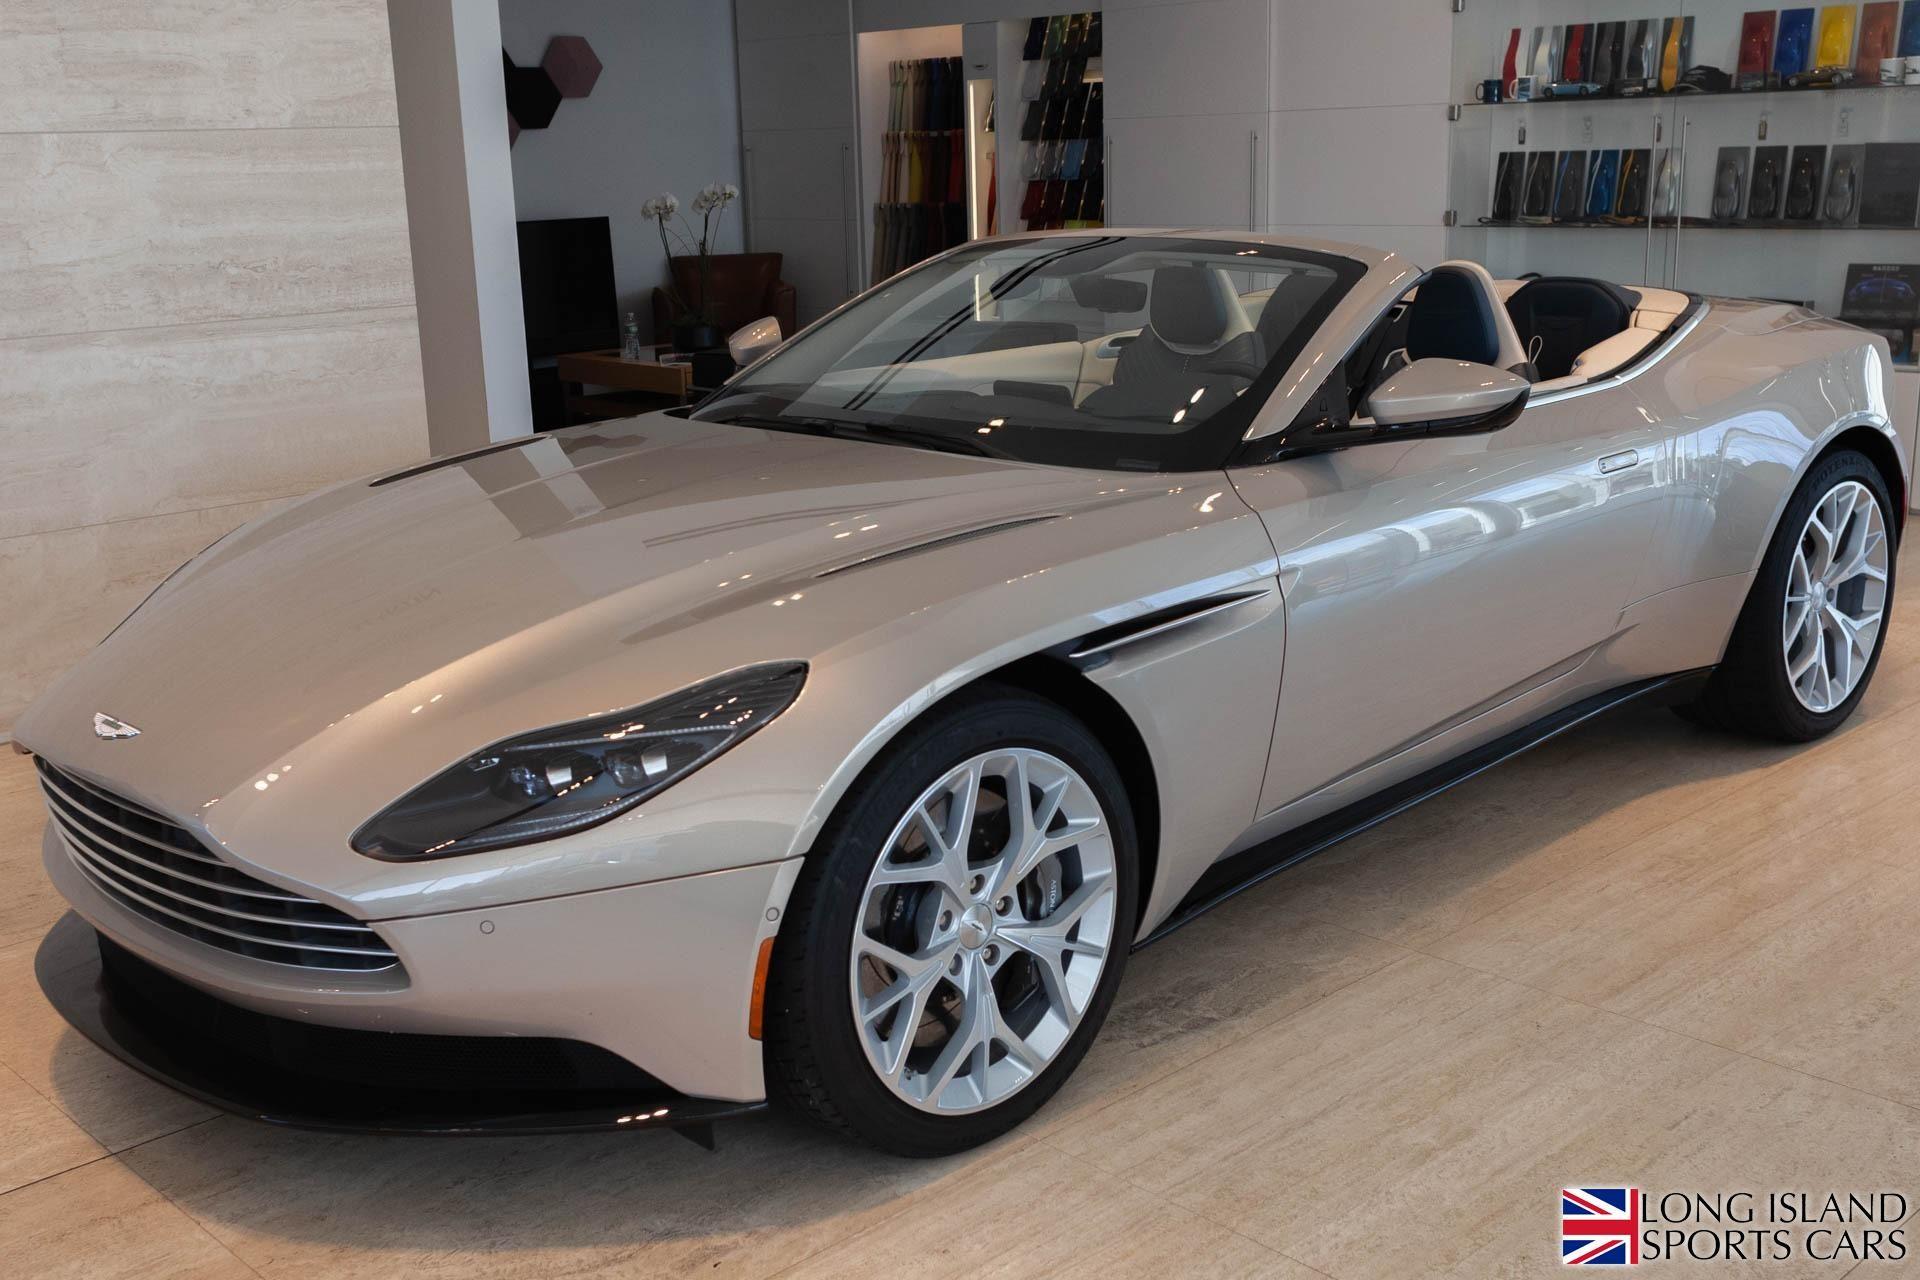 Used 2019 Aston Martin Db11 Volante Roslyn Ny Aston Martin